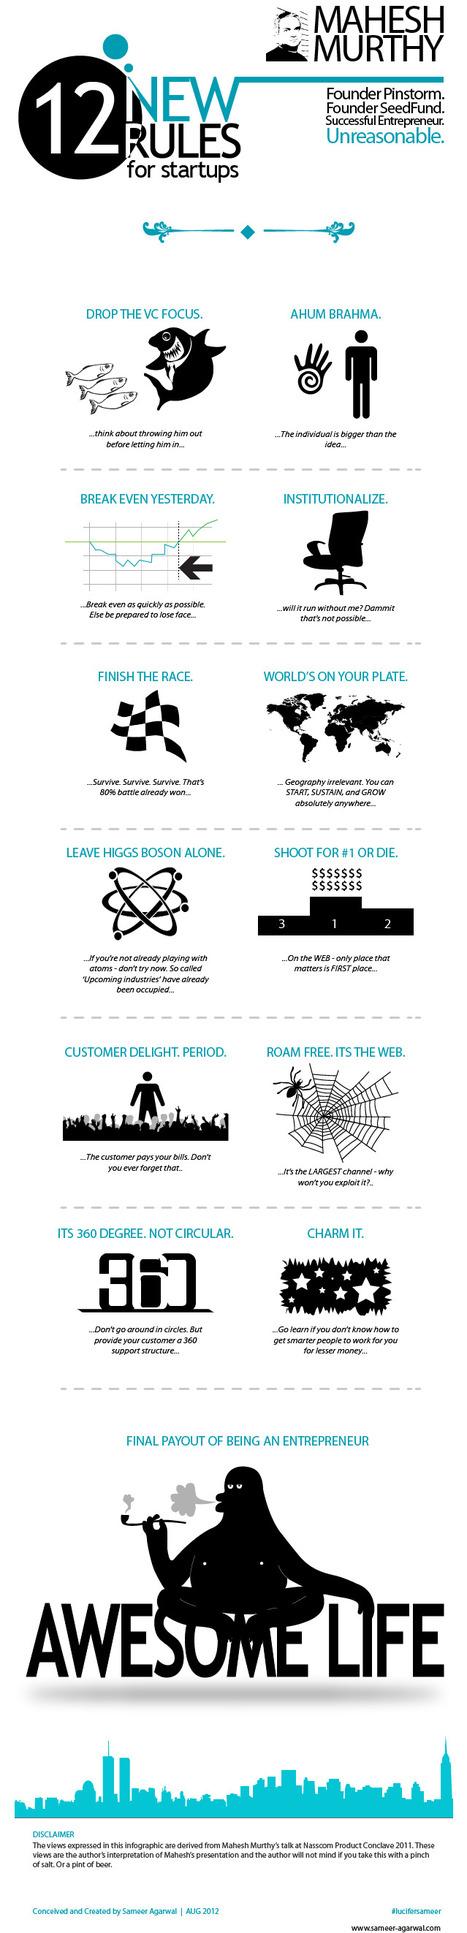 Mahesh Murthy's 12 new rules | Sameer Agarwal | Dorai on Tech & Entrepreneurship | Scoop.it